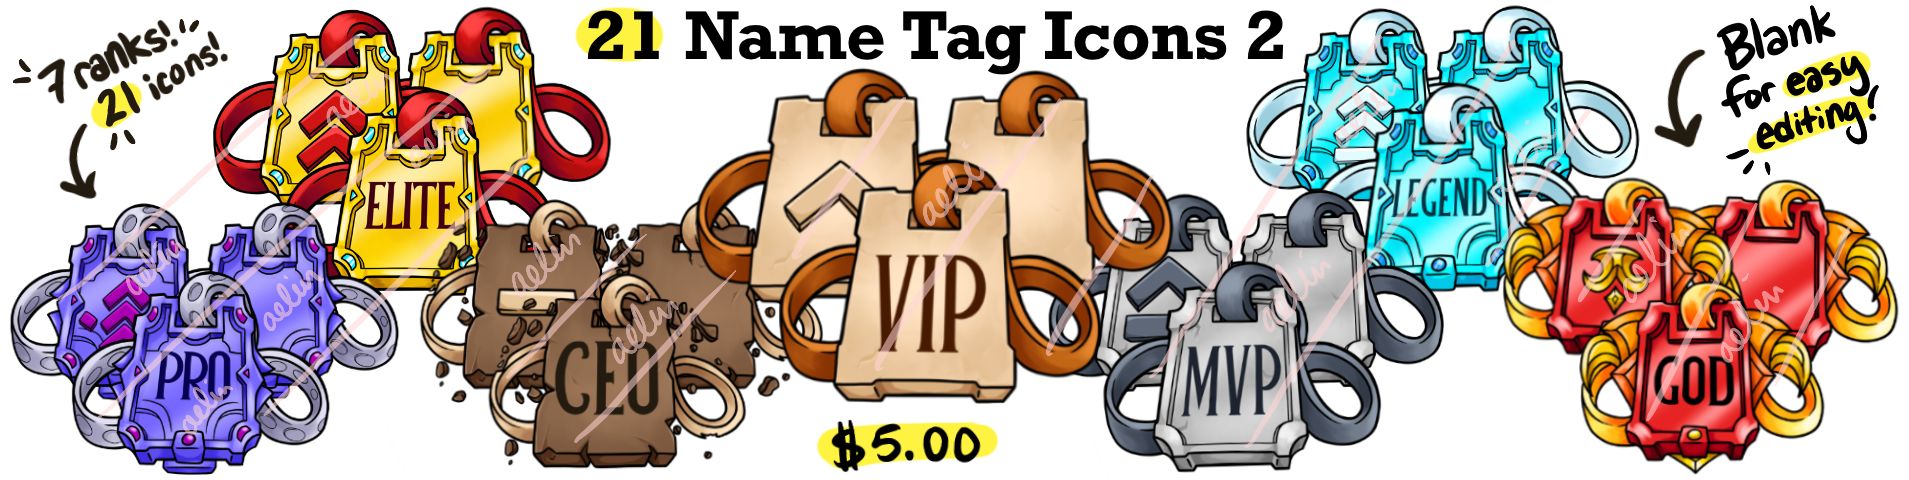 21 Name Tag Rank Buycraft Icons - Buycraft Rank Icons (Minecraft Rank Icons) Minecraft Icon Pack